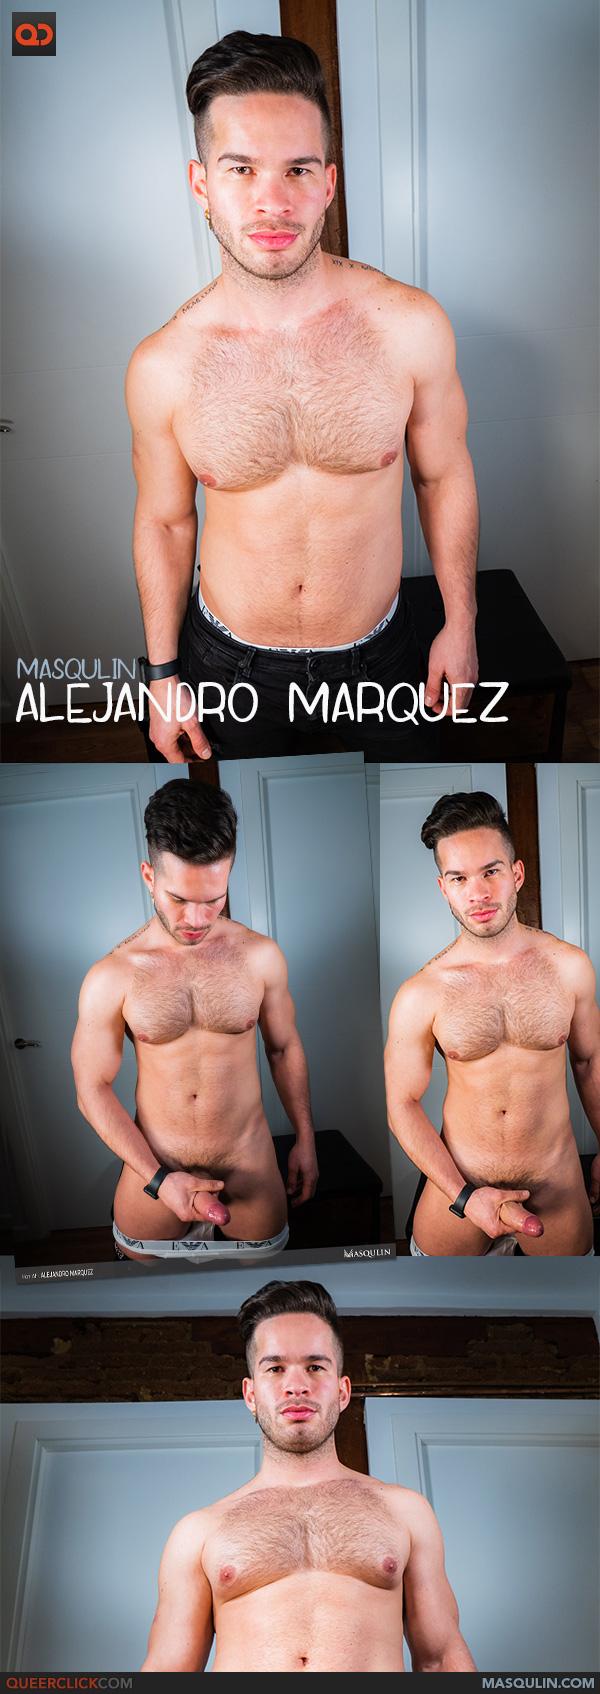 Masqulin: Alejandro Marquez